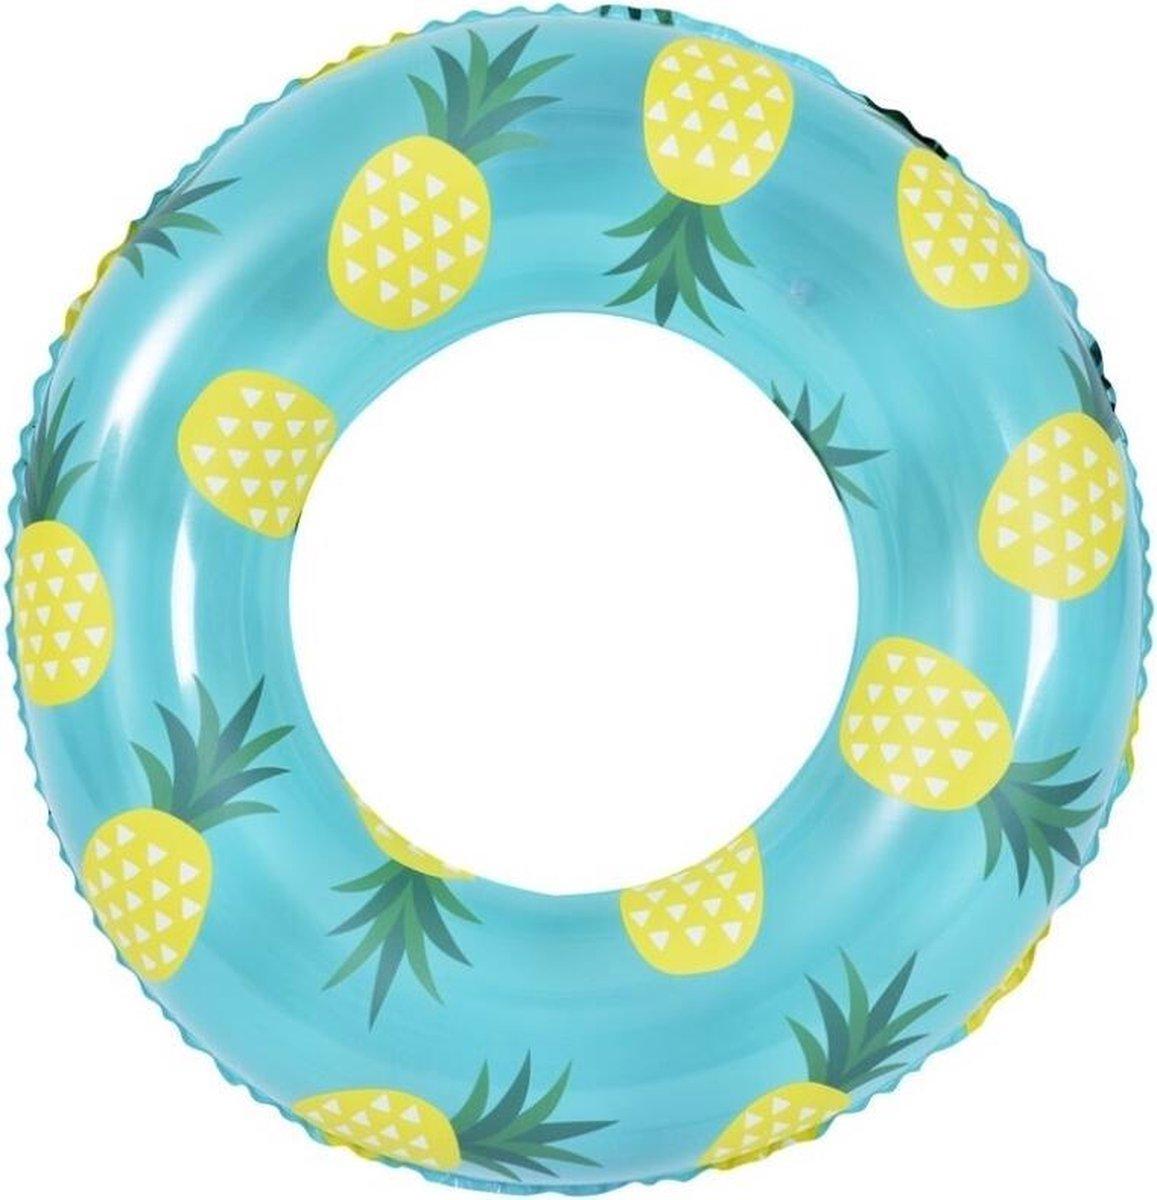 Jilong Zwemband Sunclub Ananas 90 X 35 Cm Vinyl Lichtblauw